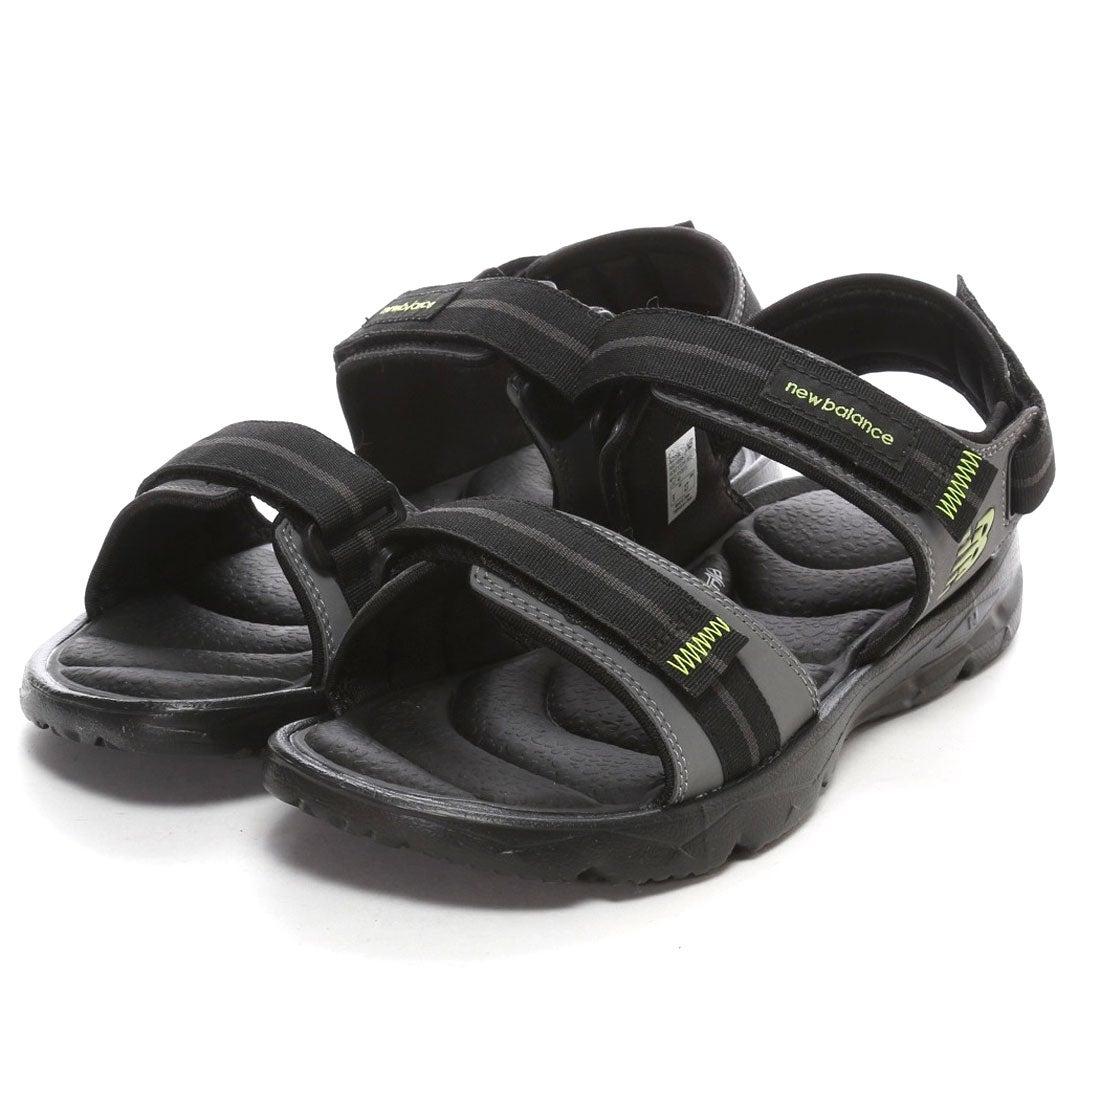 f0917daecab64 ニューバランス new balance NB SD212 GL (グレイ/ライム) -靴&ファッション通販 ロコンド〜自宅で試着、気軽に返品